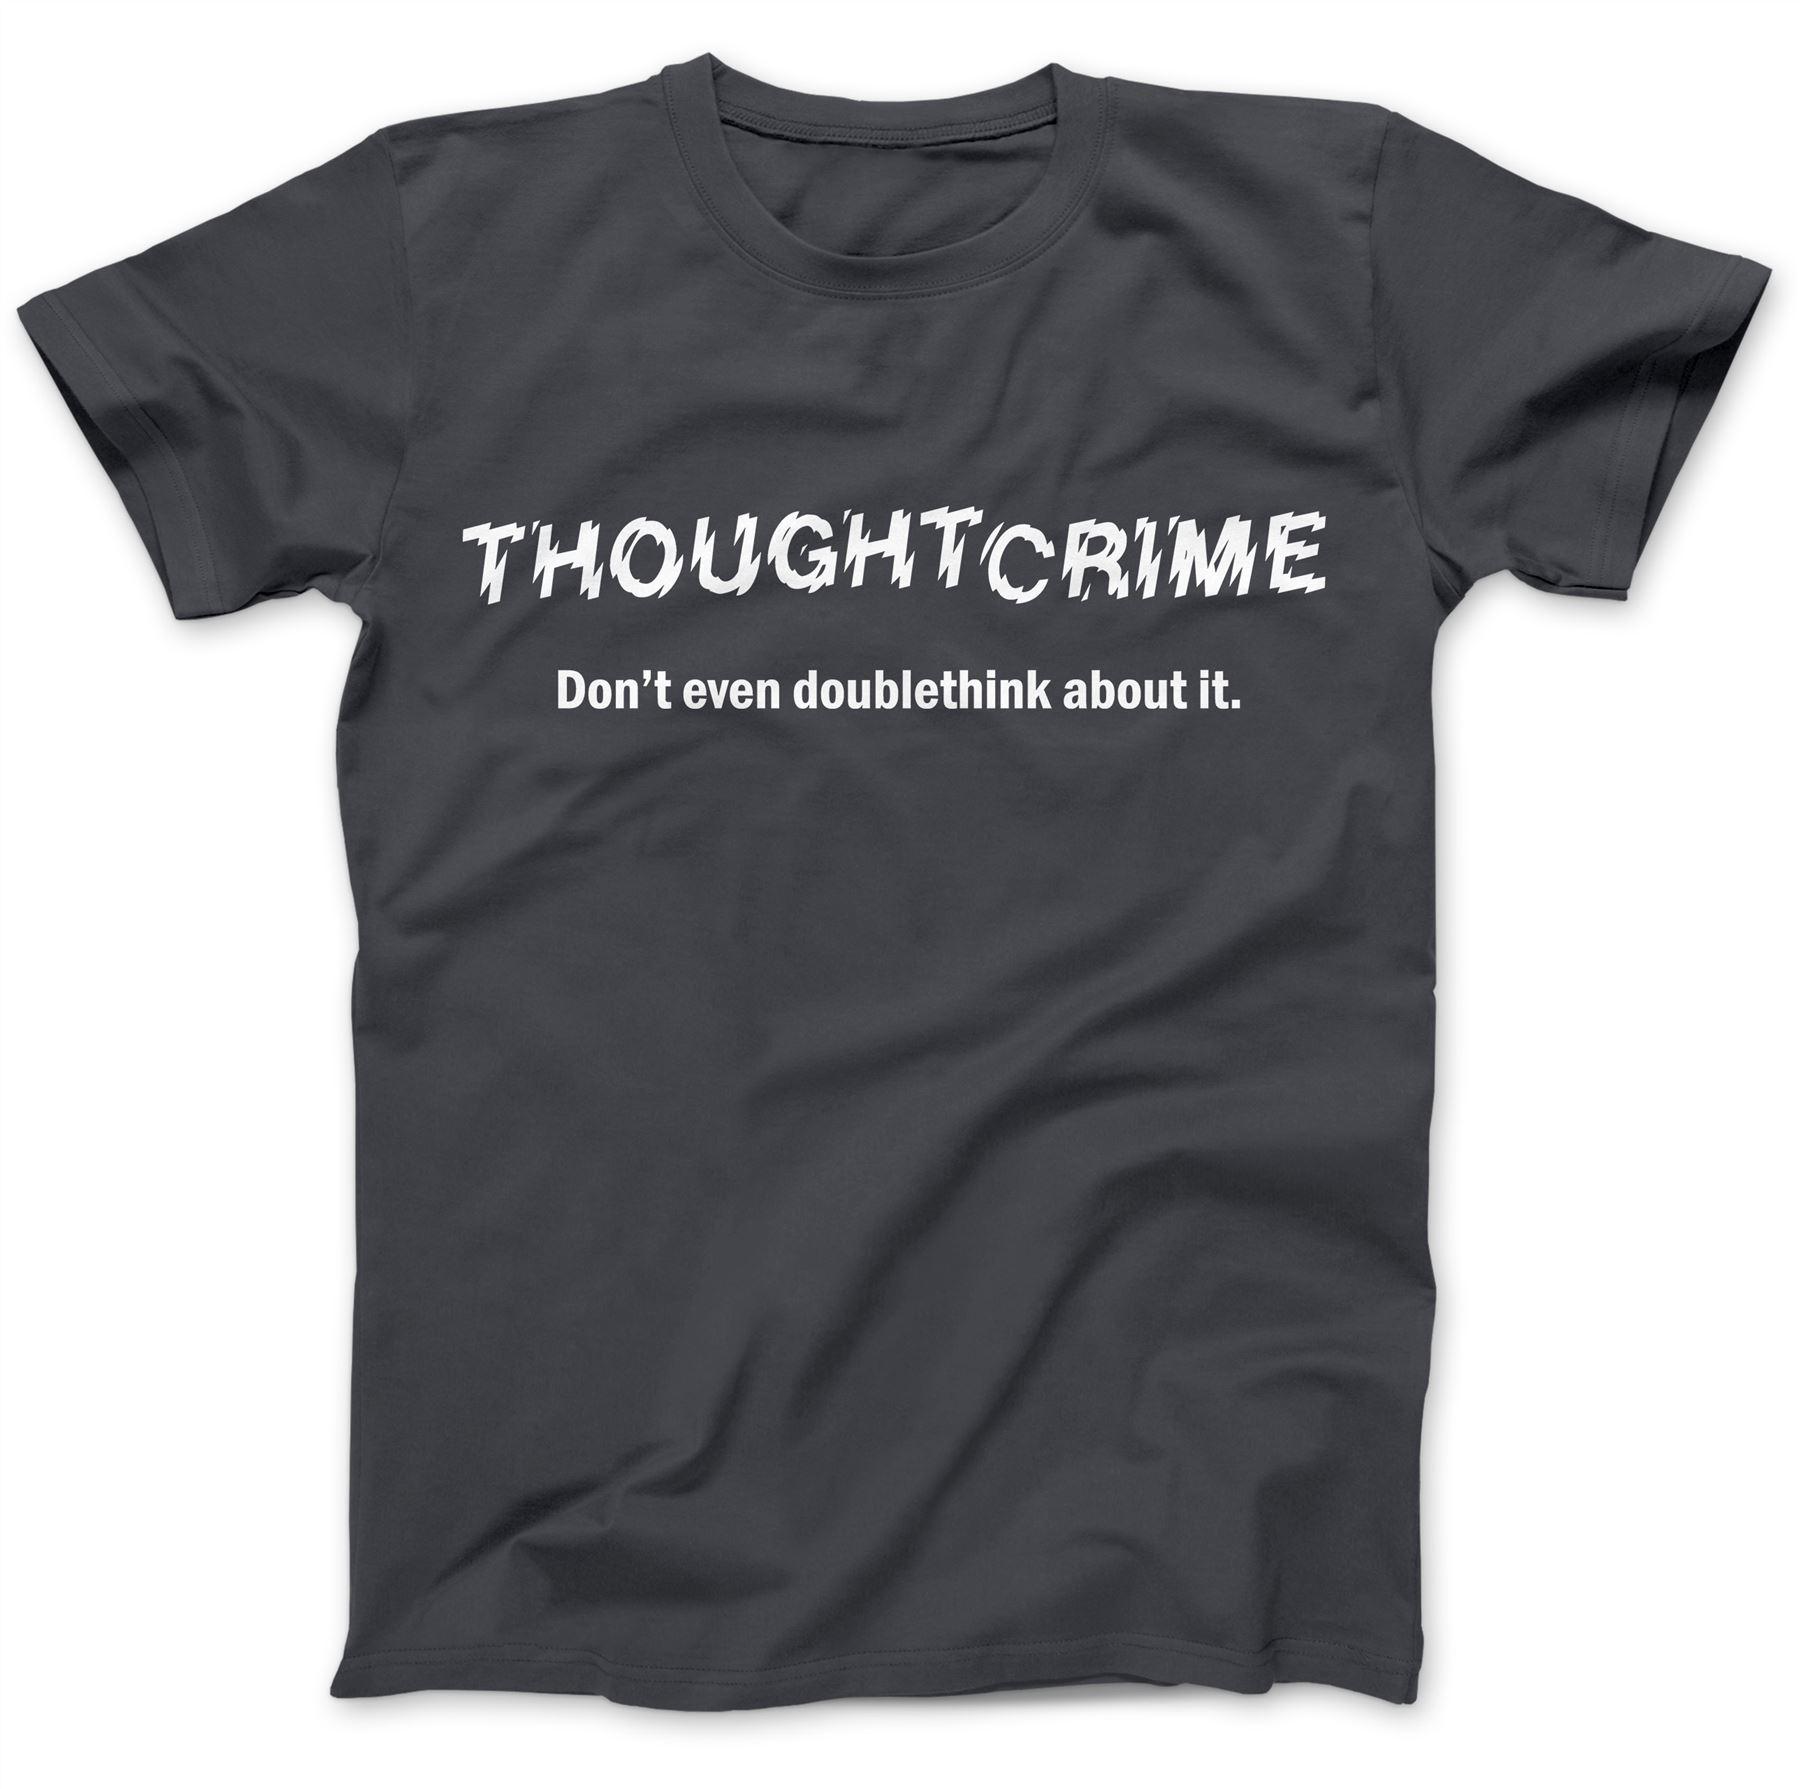 1984-Thought-Crime-George-Orwell-T-Shirt-100-Premium-Cotton-Animal-Farm miniatuur 12